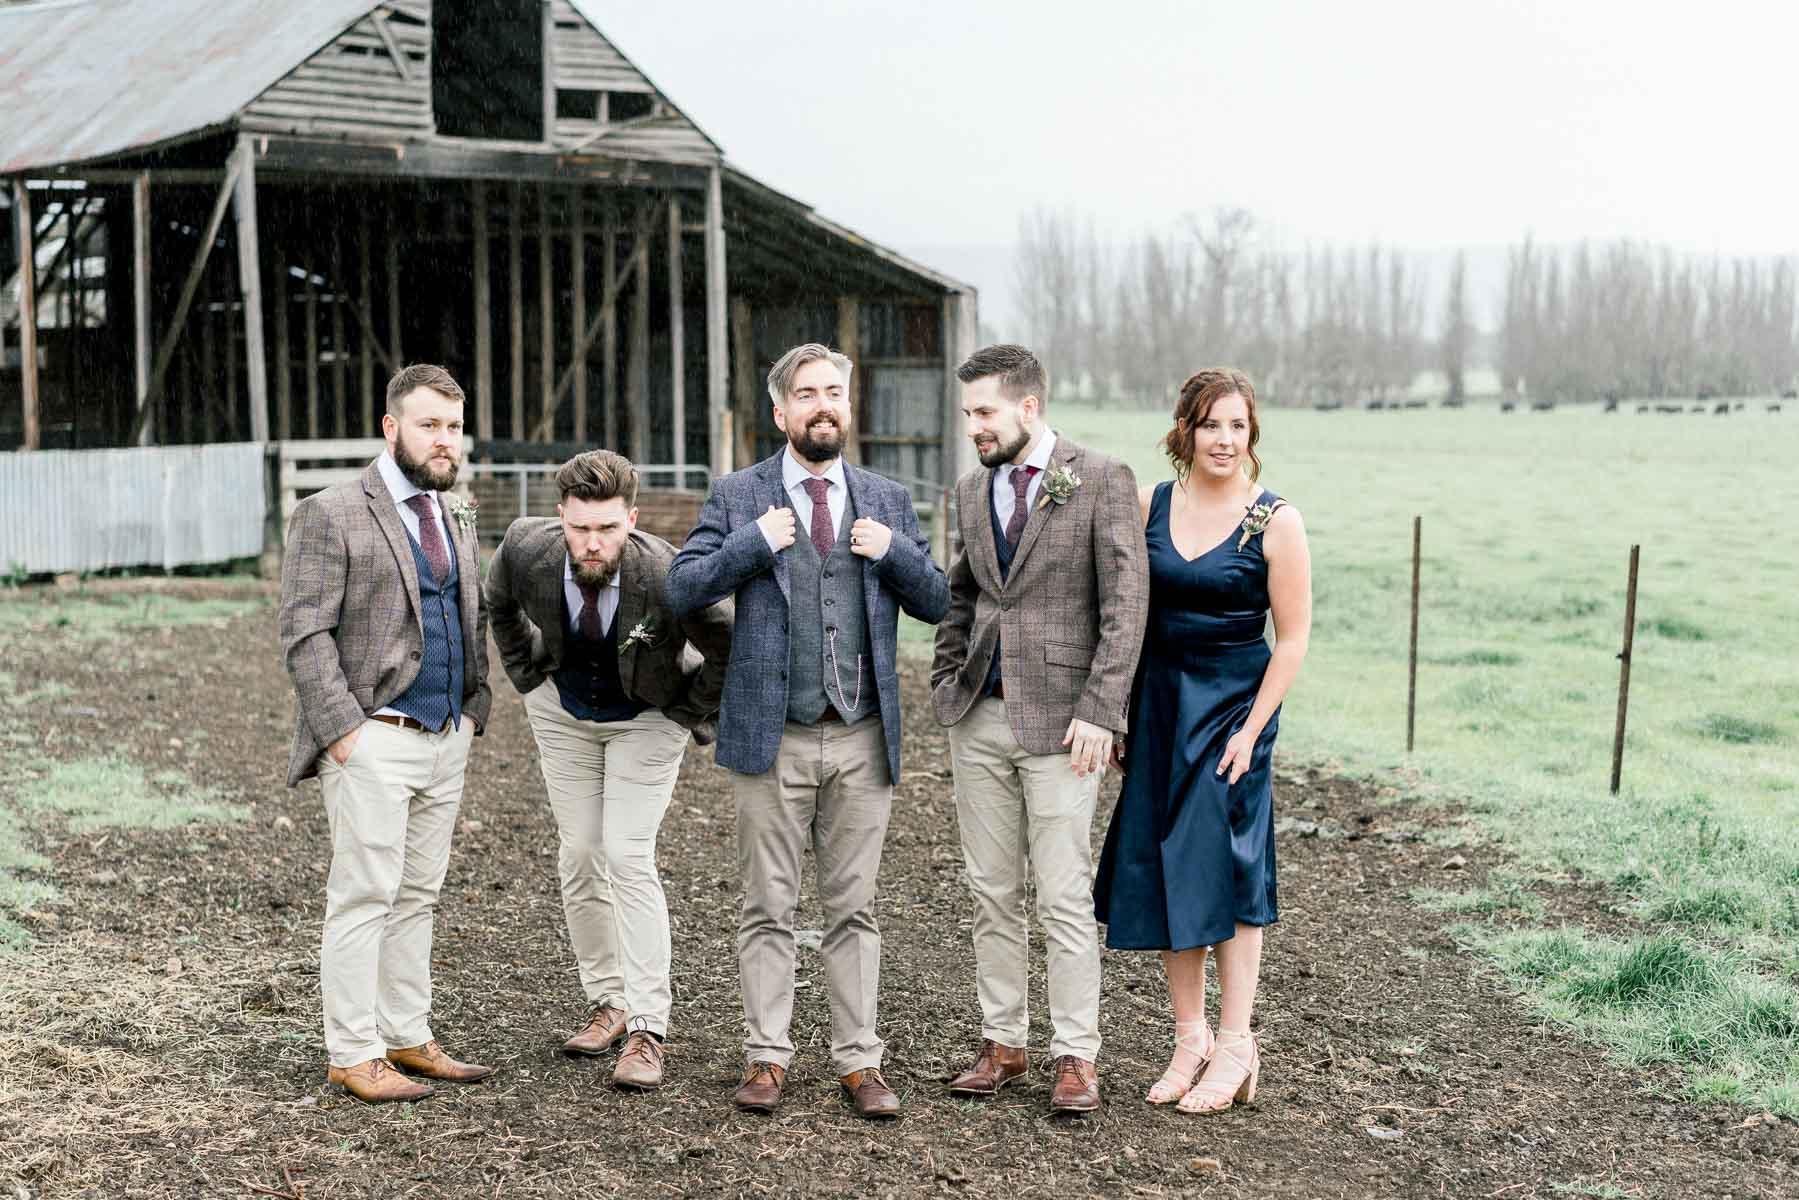 adams-farm-coldstream-yarra-valley-wedding-heart+soul-weddings-kel-jarryd-05717.jpg